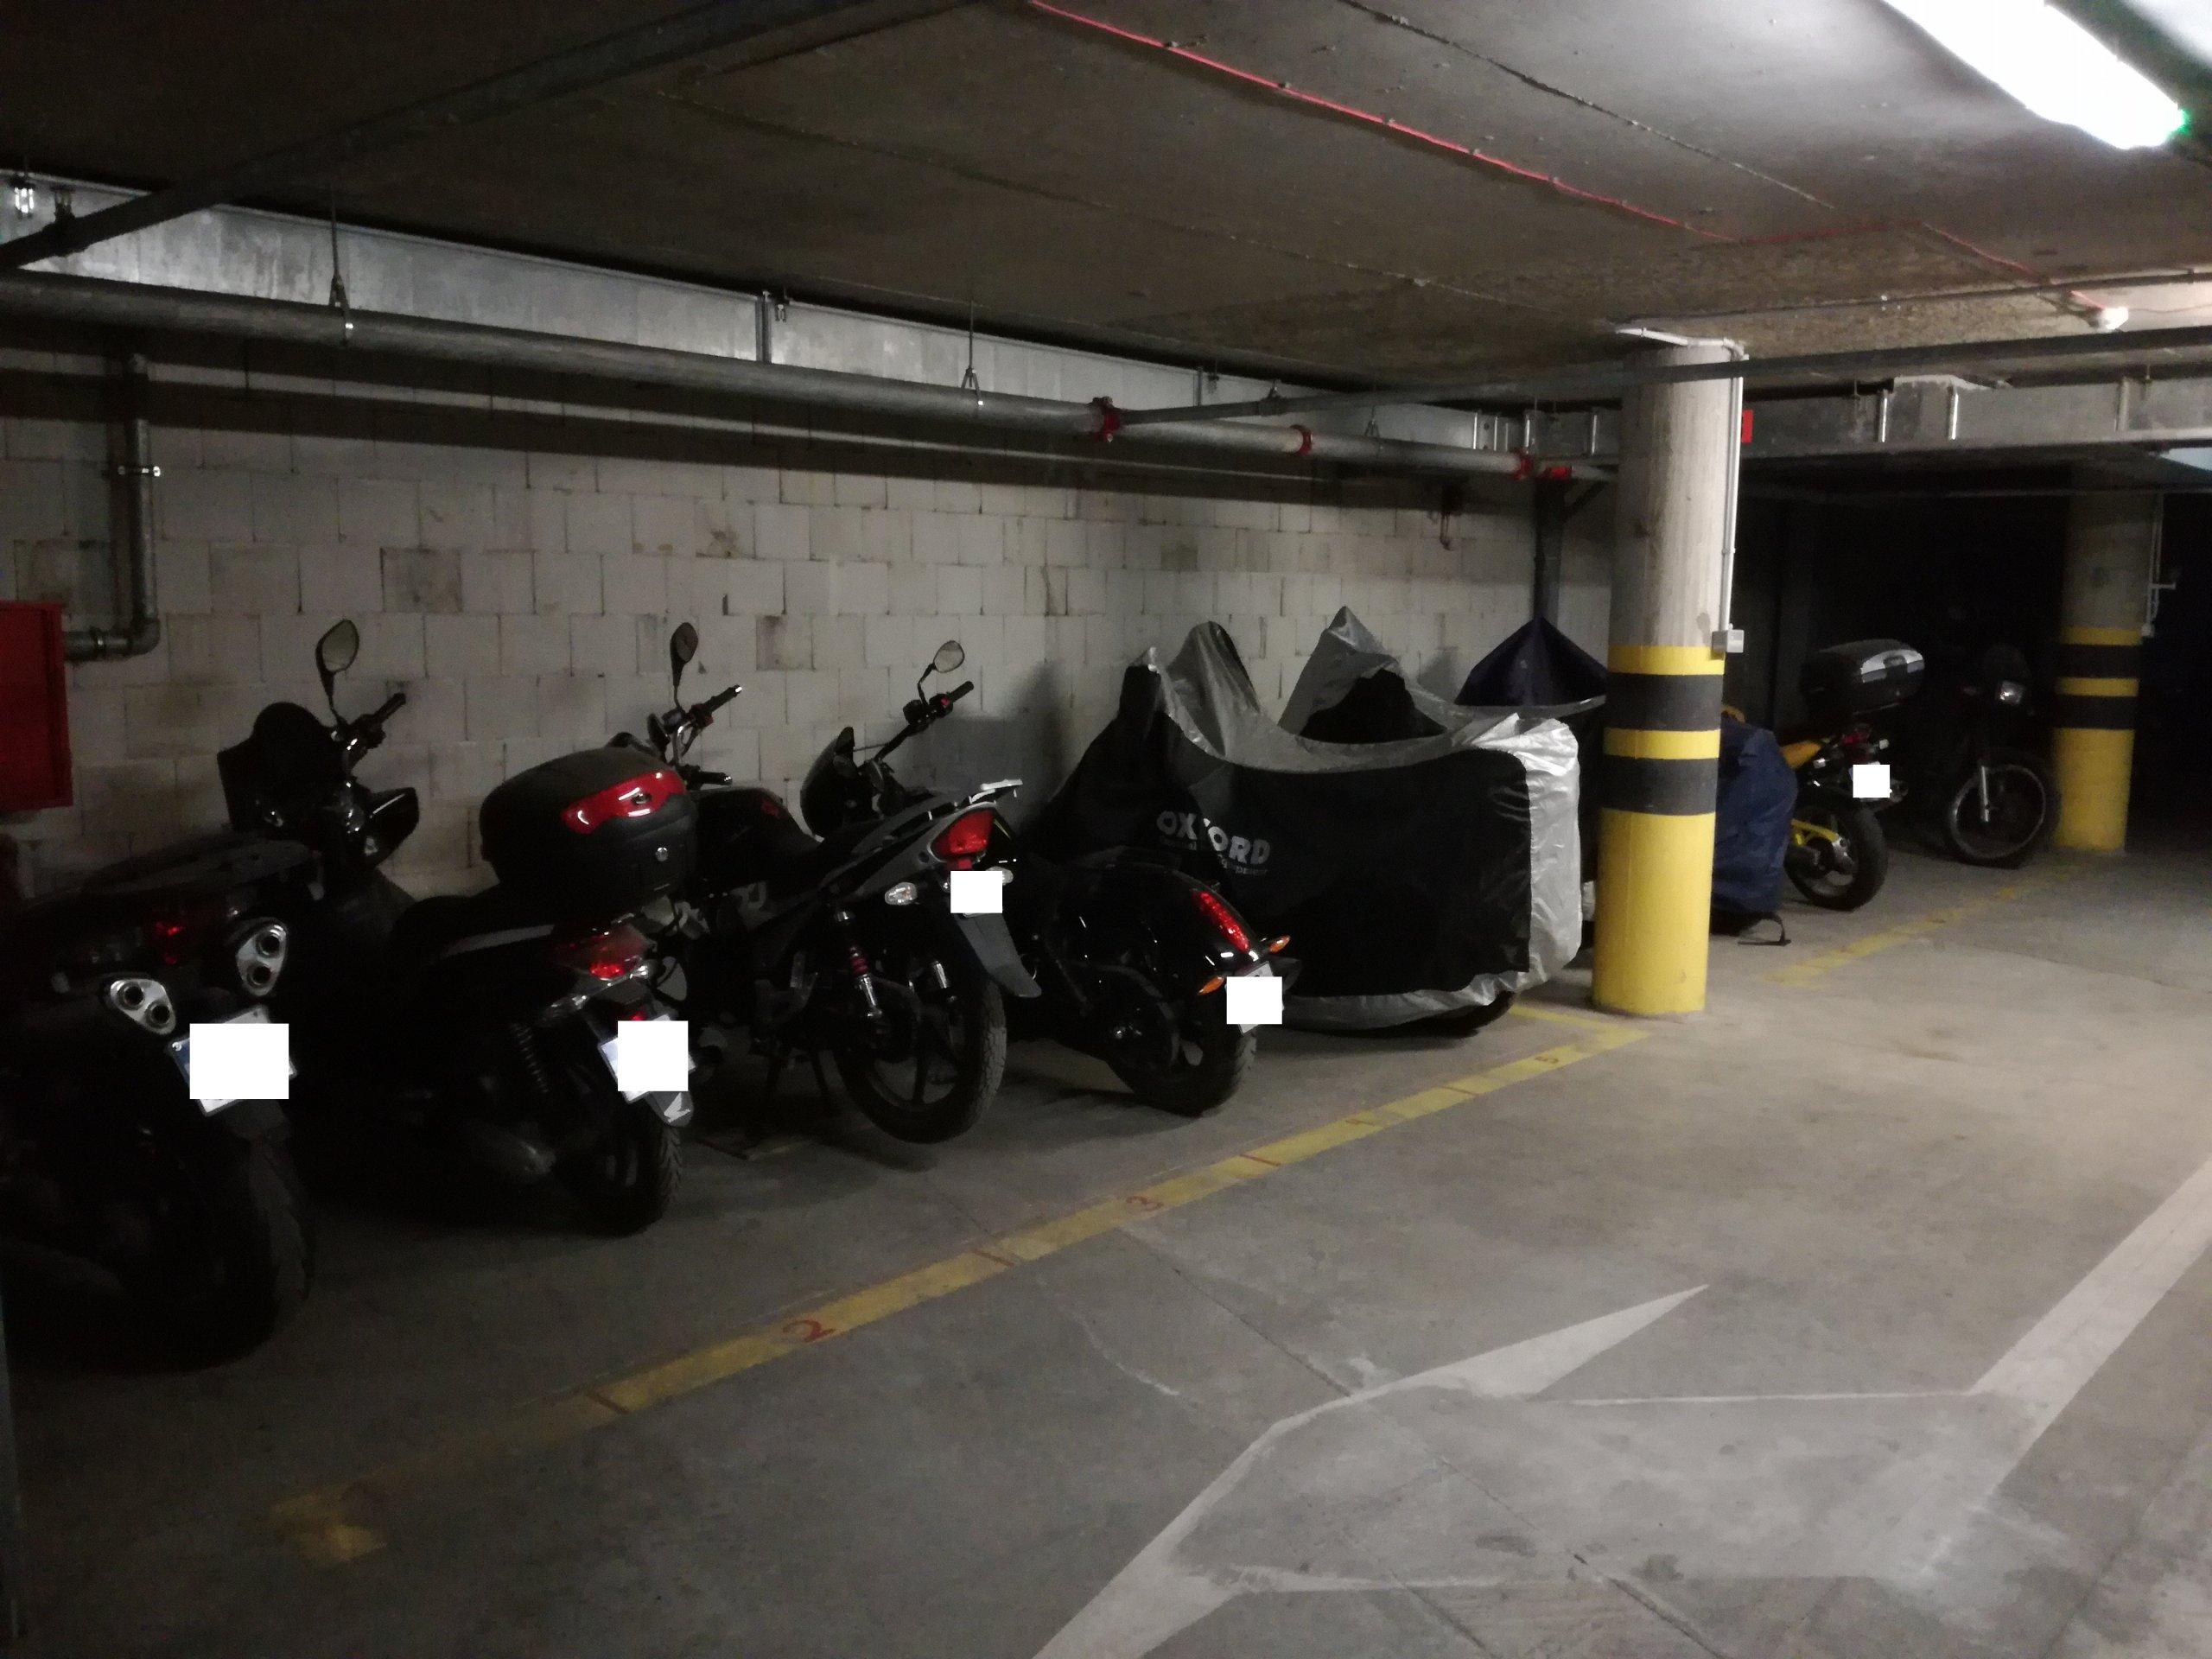 Garaż Miejsce Postojowe Na Motocykl 7258136651 Oficjalne